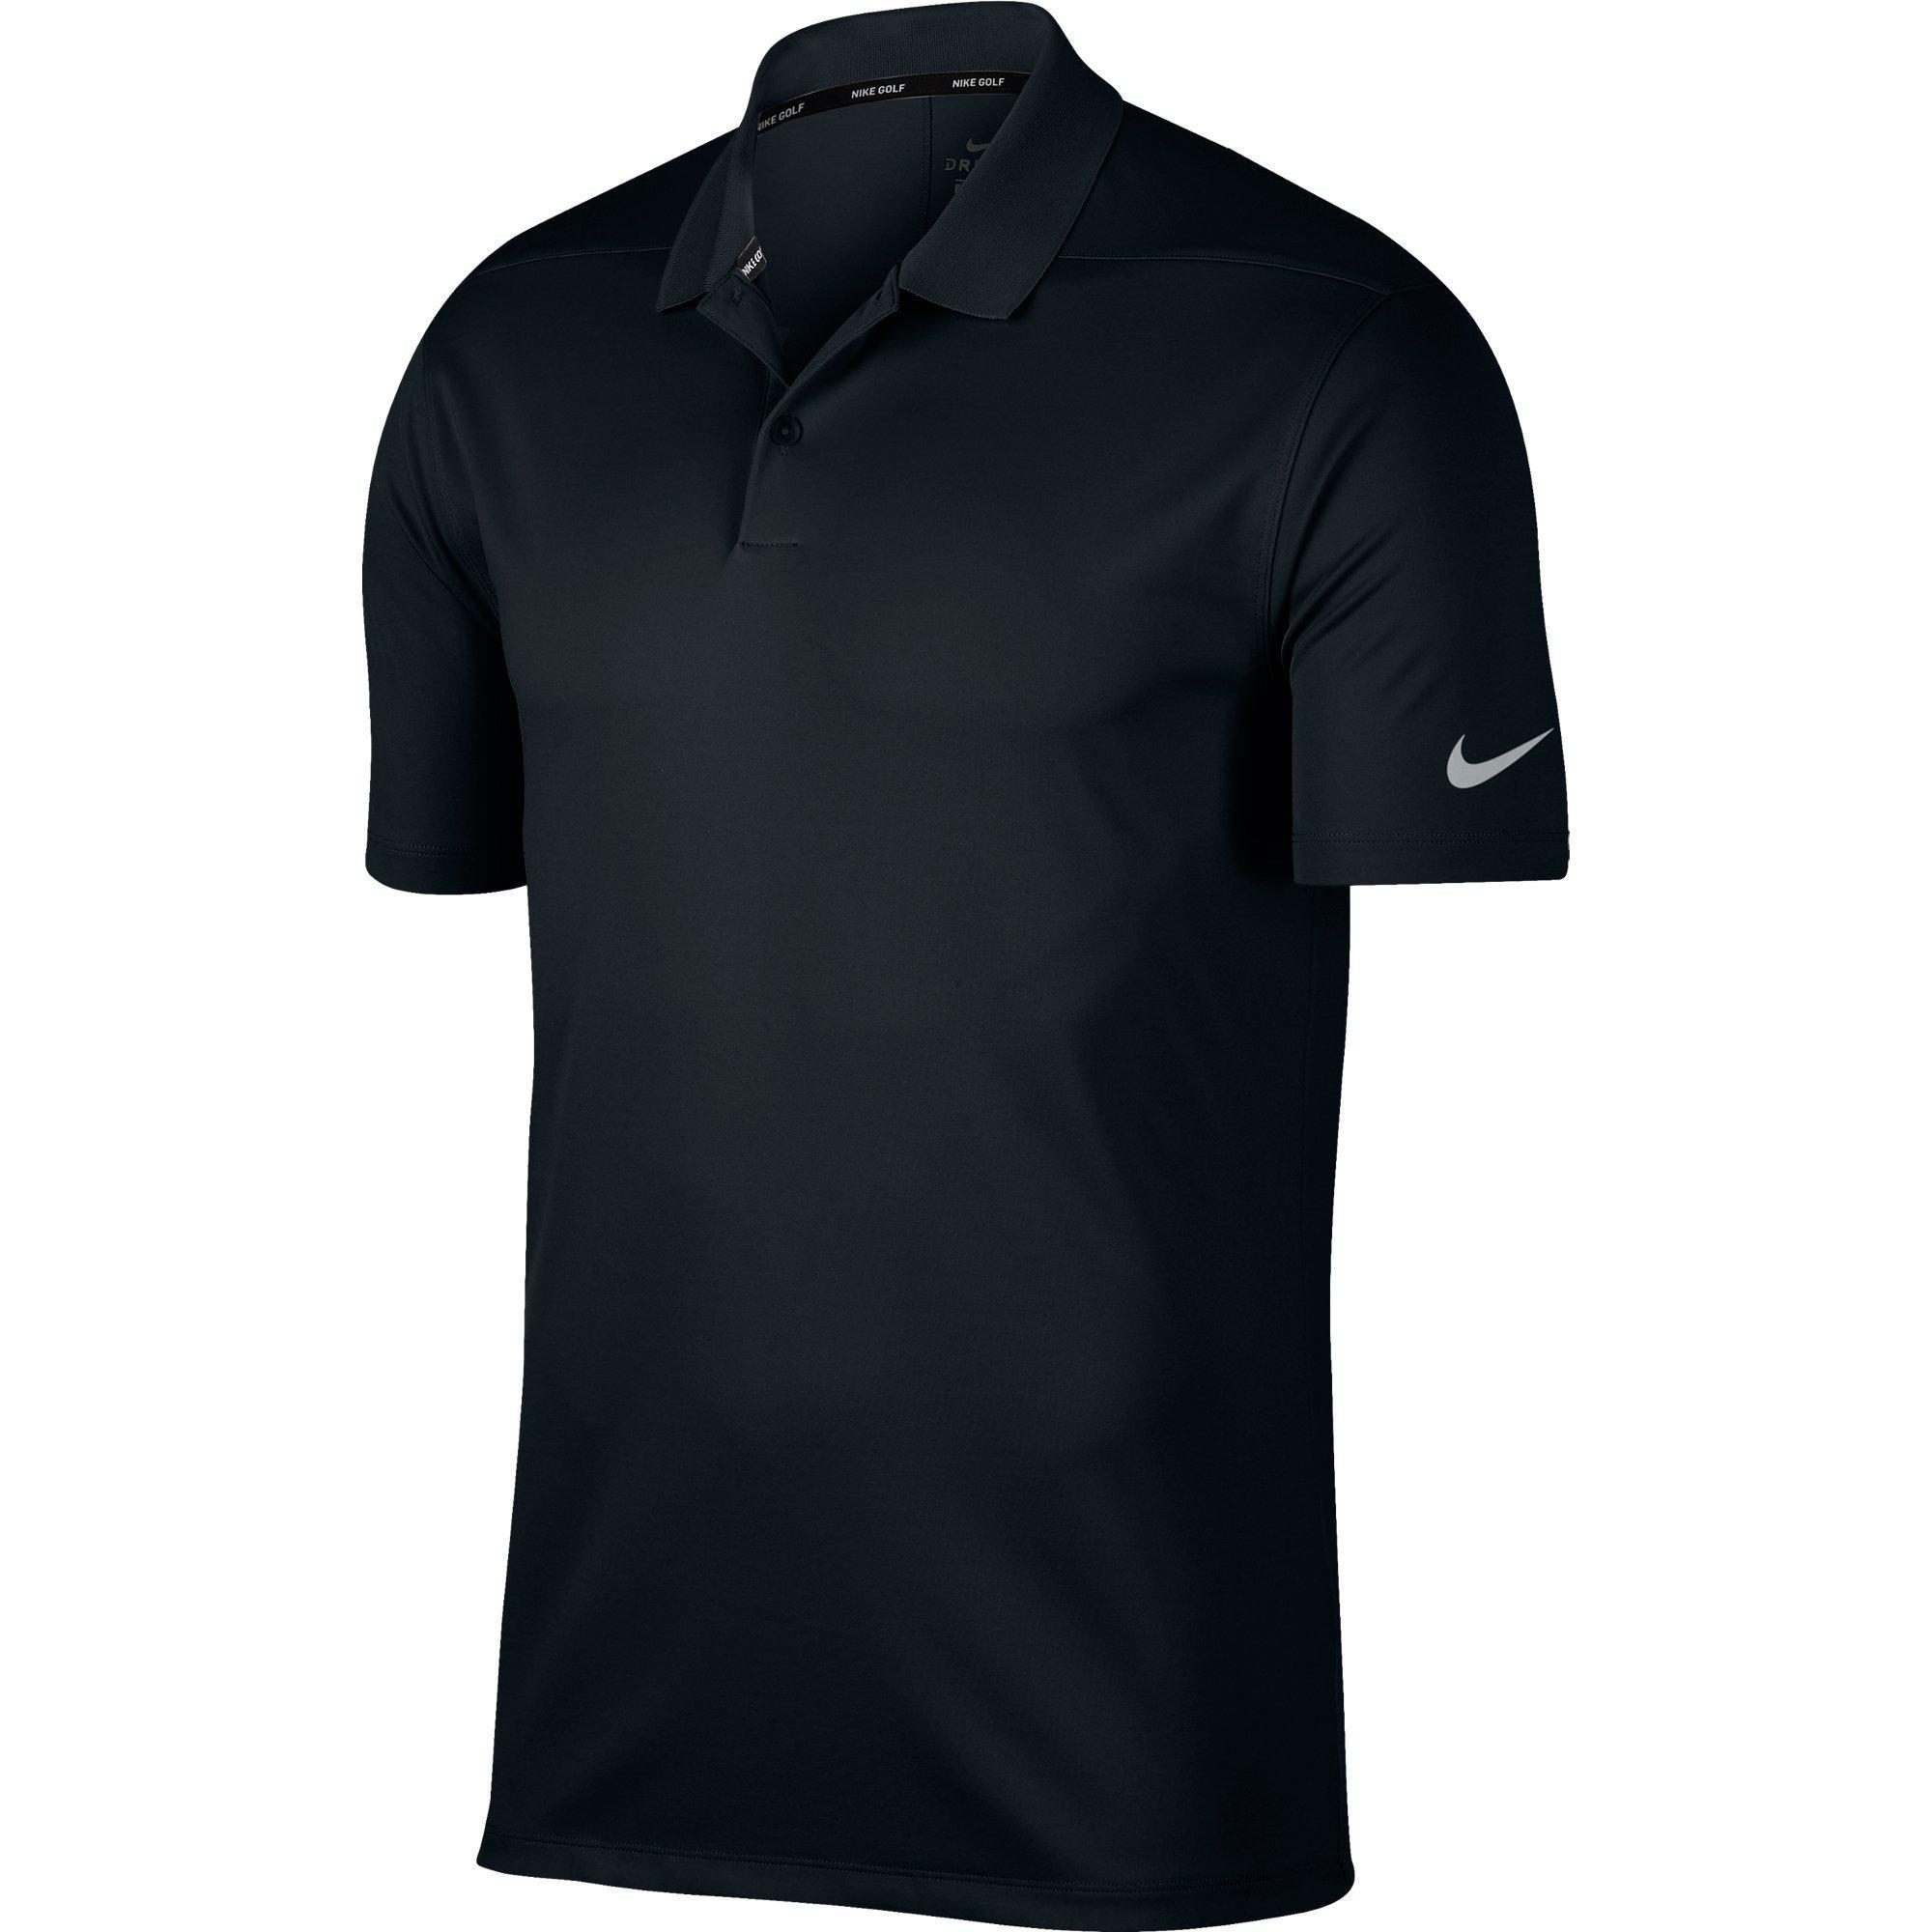 Men's Victory Short Sleeve Polo